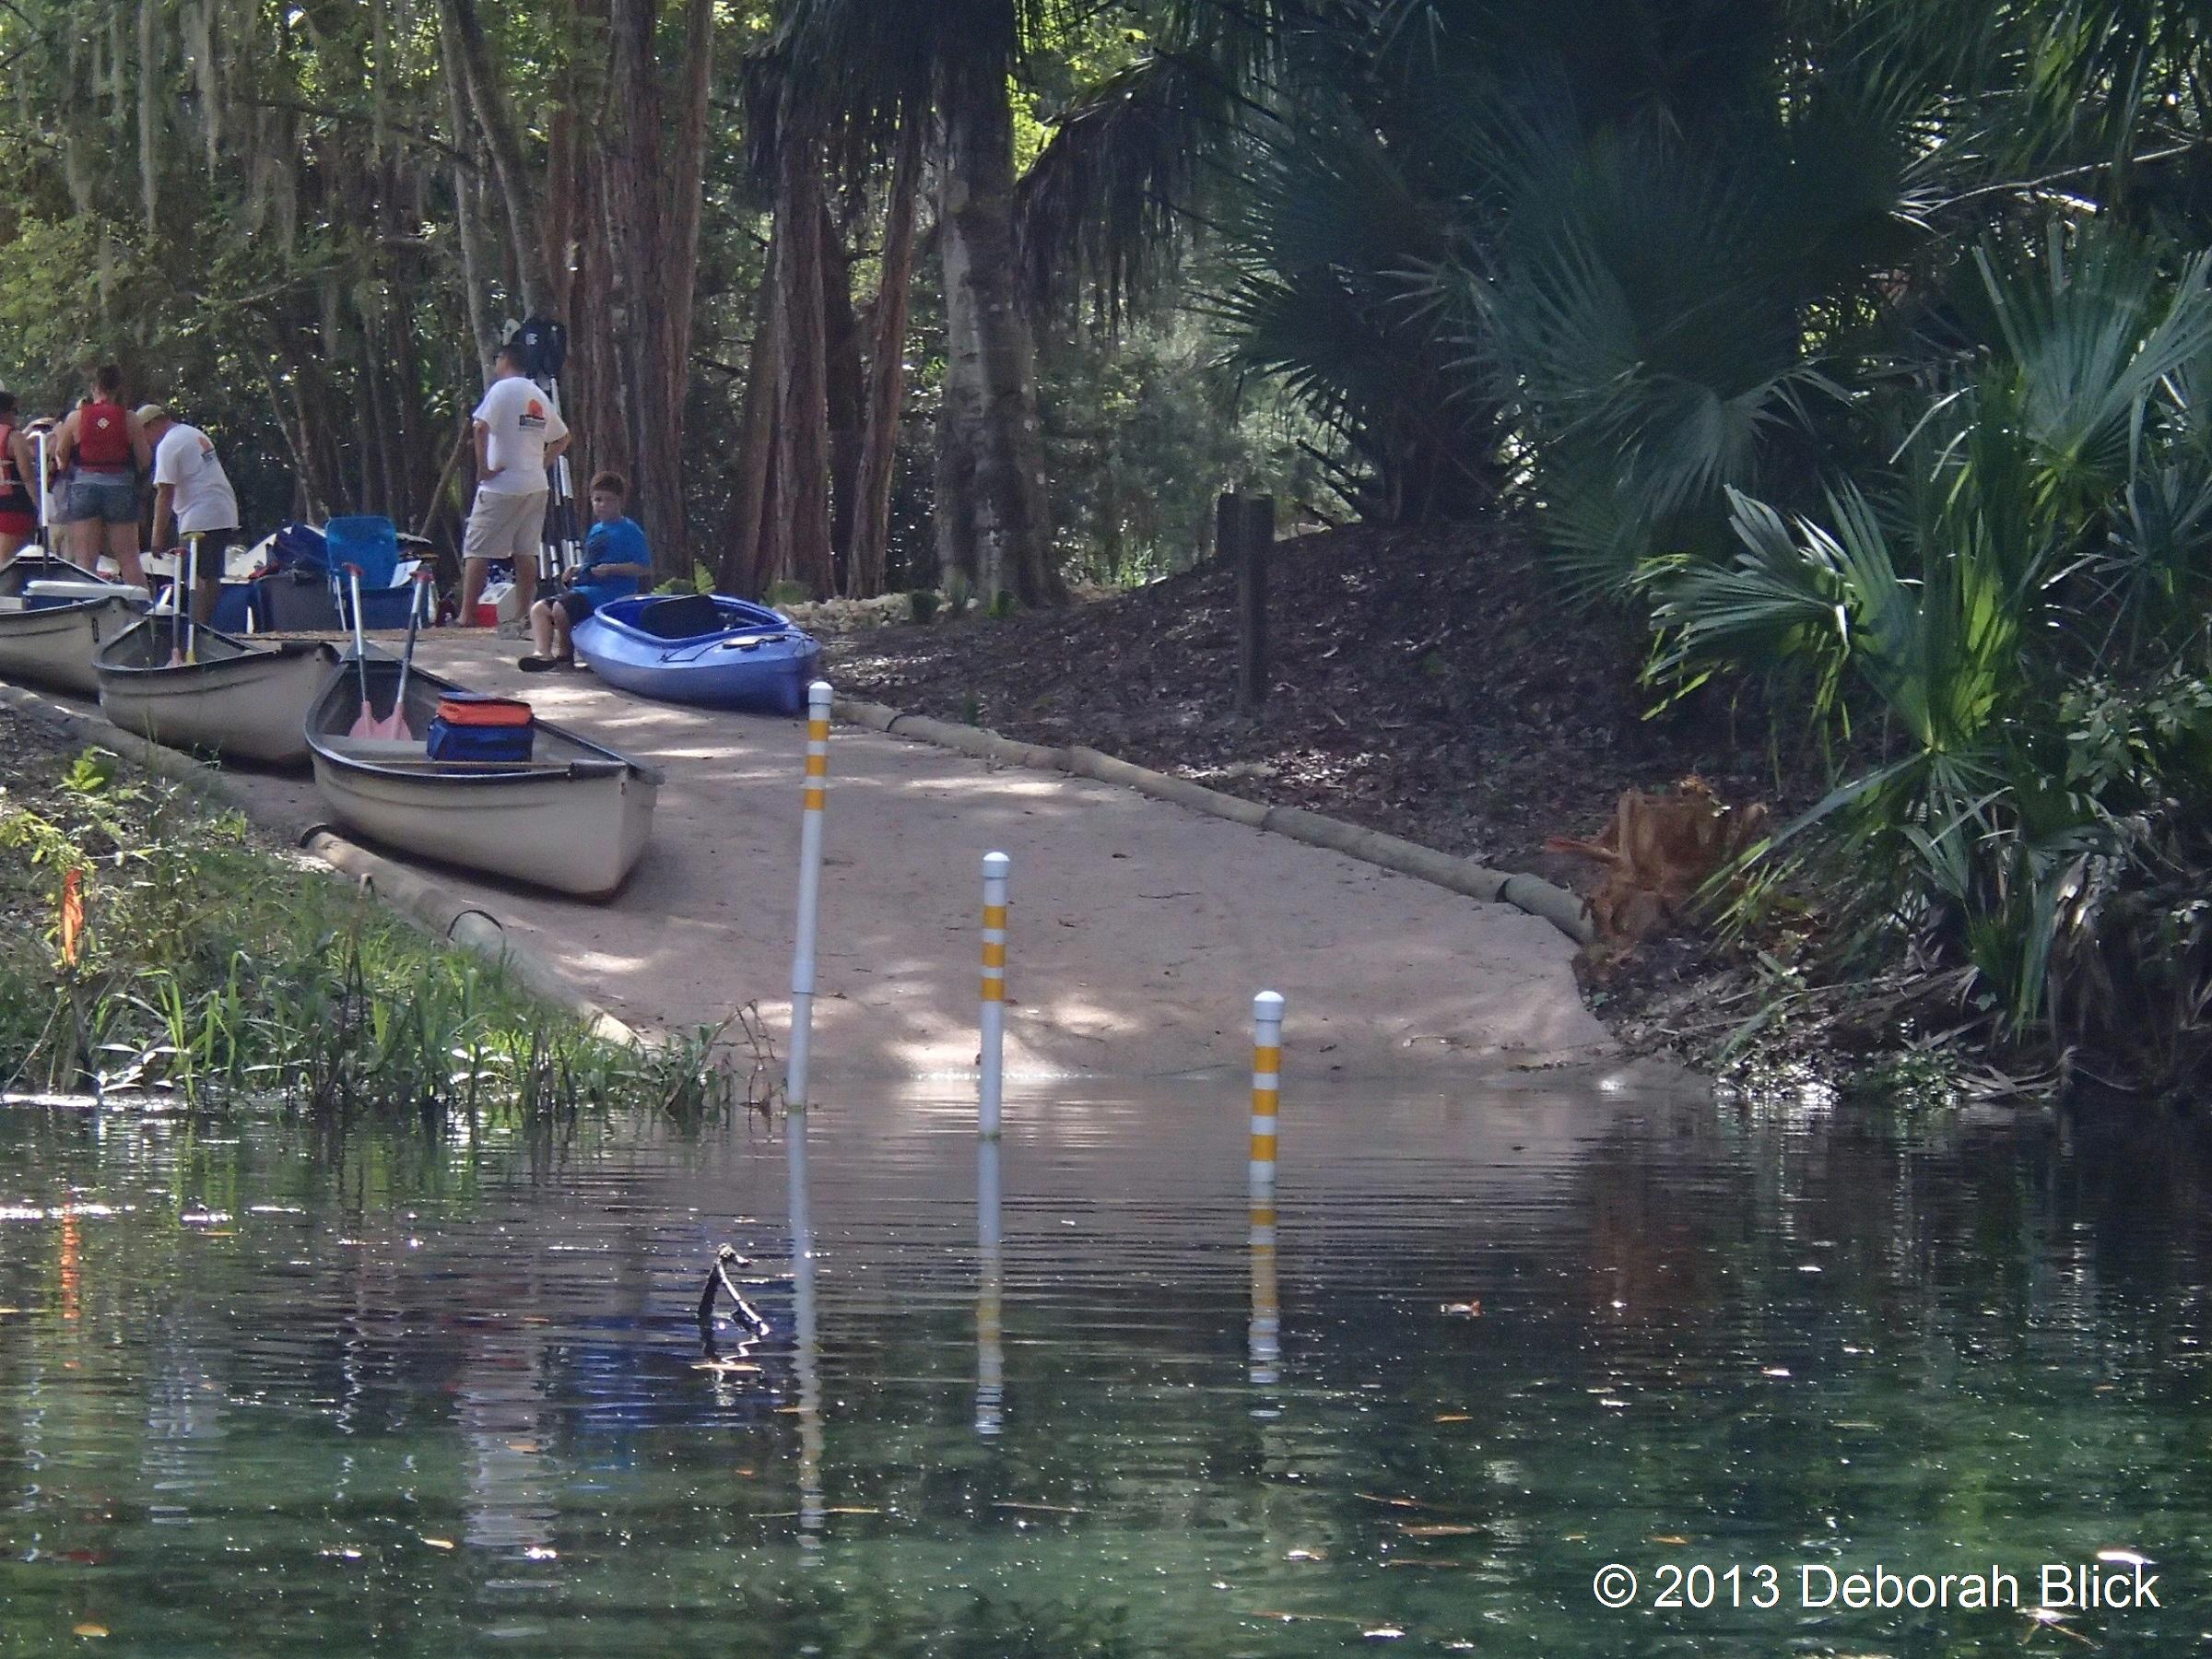 Silver River - Silver River Florida Map